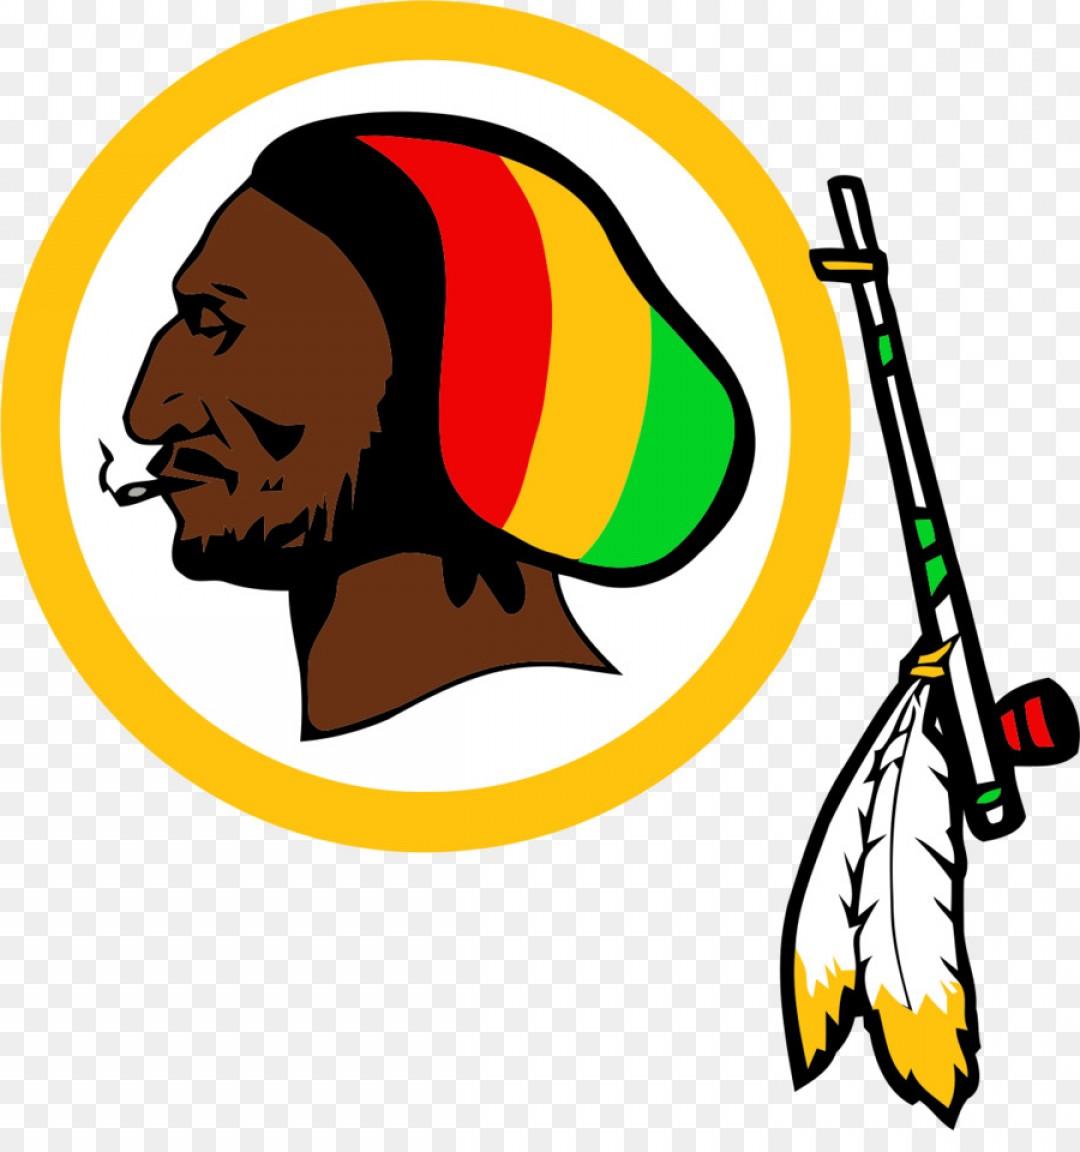 Washington Redskins Clipart.